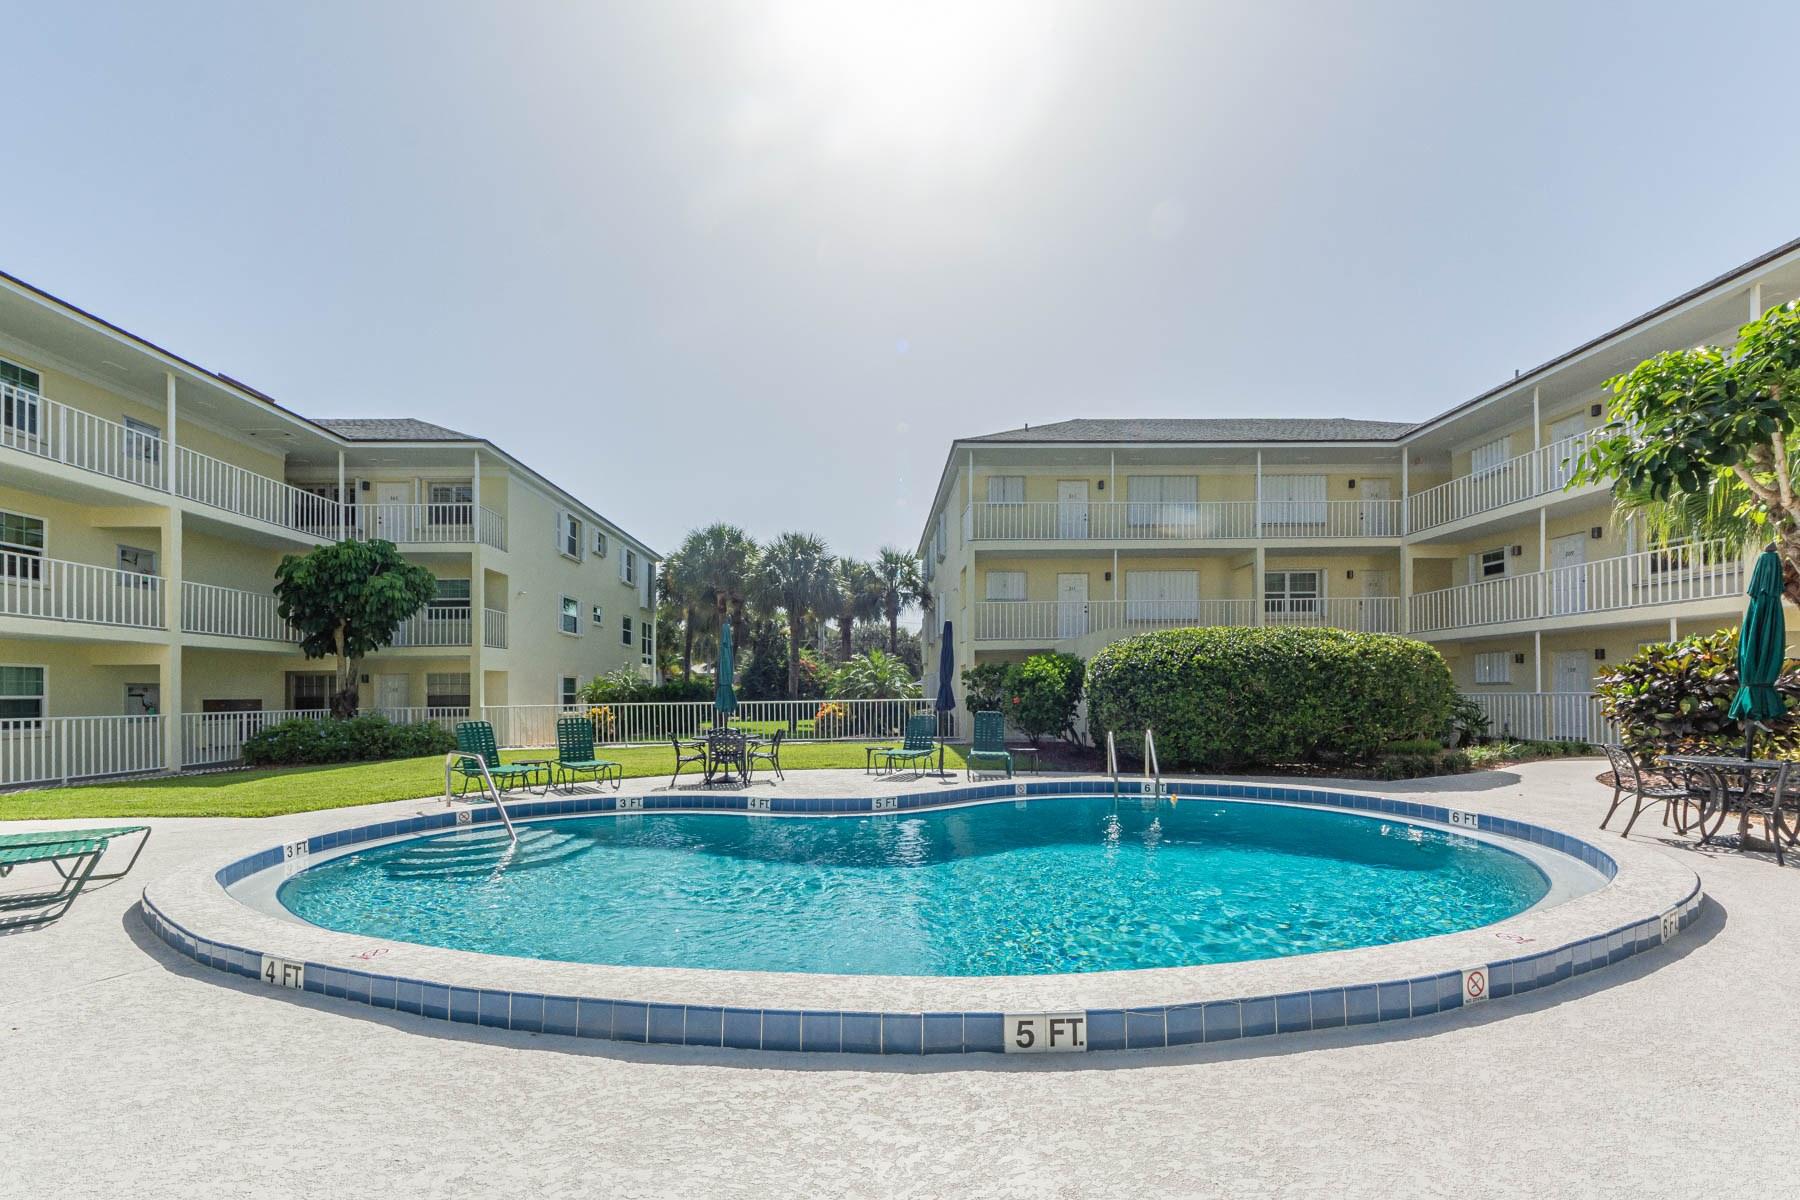 Property for Sale at 1441 Ocean Drive, #303, Vero Beach, FL 1441 Ocean Drive, 303 Vero Beach, Florida 32963 United States